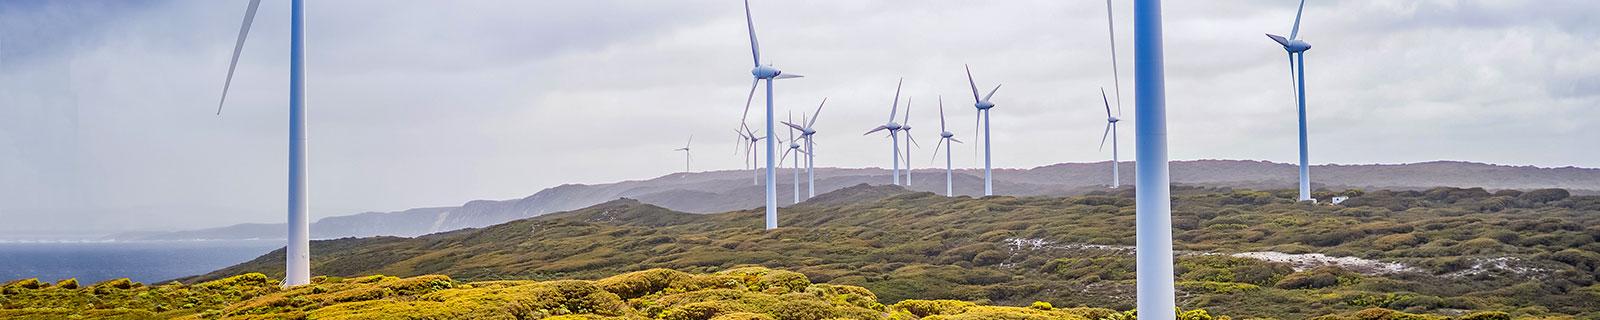 Albany wind farm, Harry Cunningham